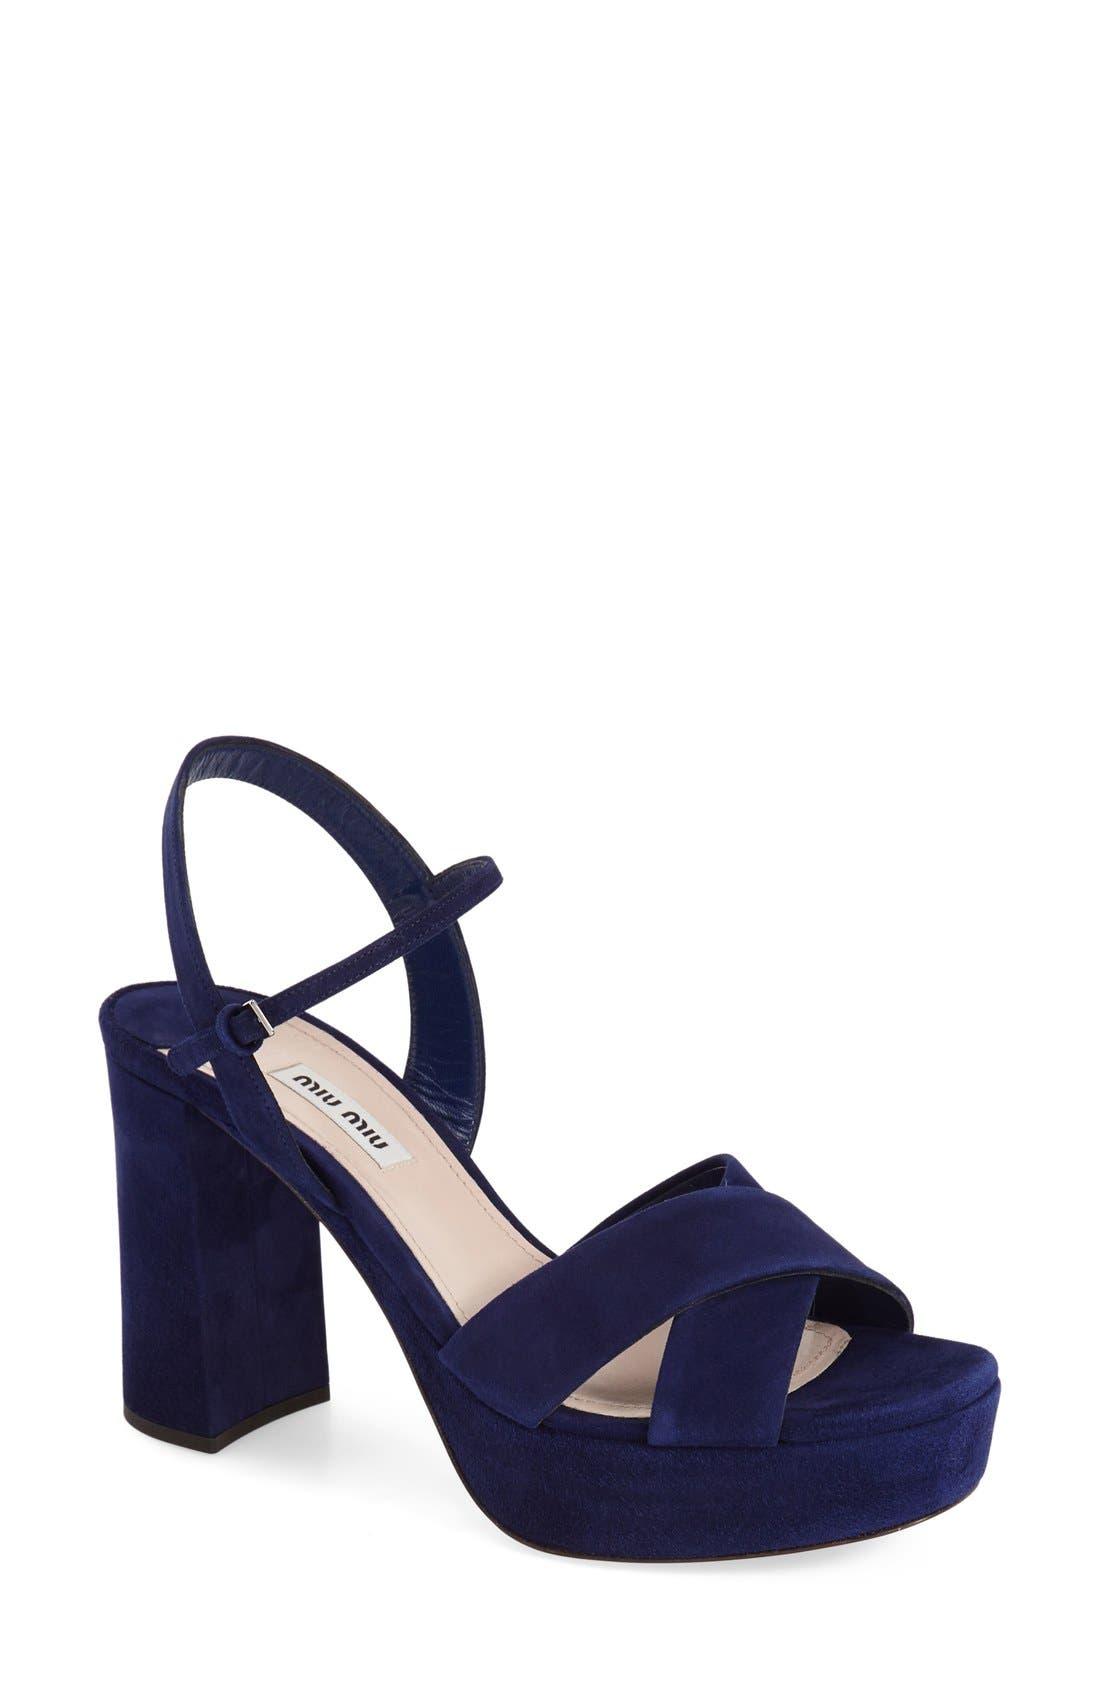 Alternate Image 1 Selected - Miu Miu Platform Sandal (Women)